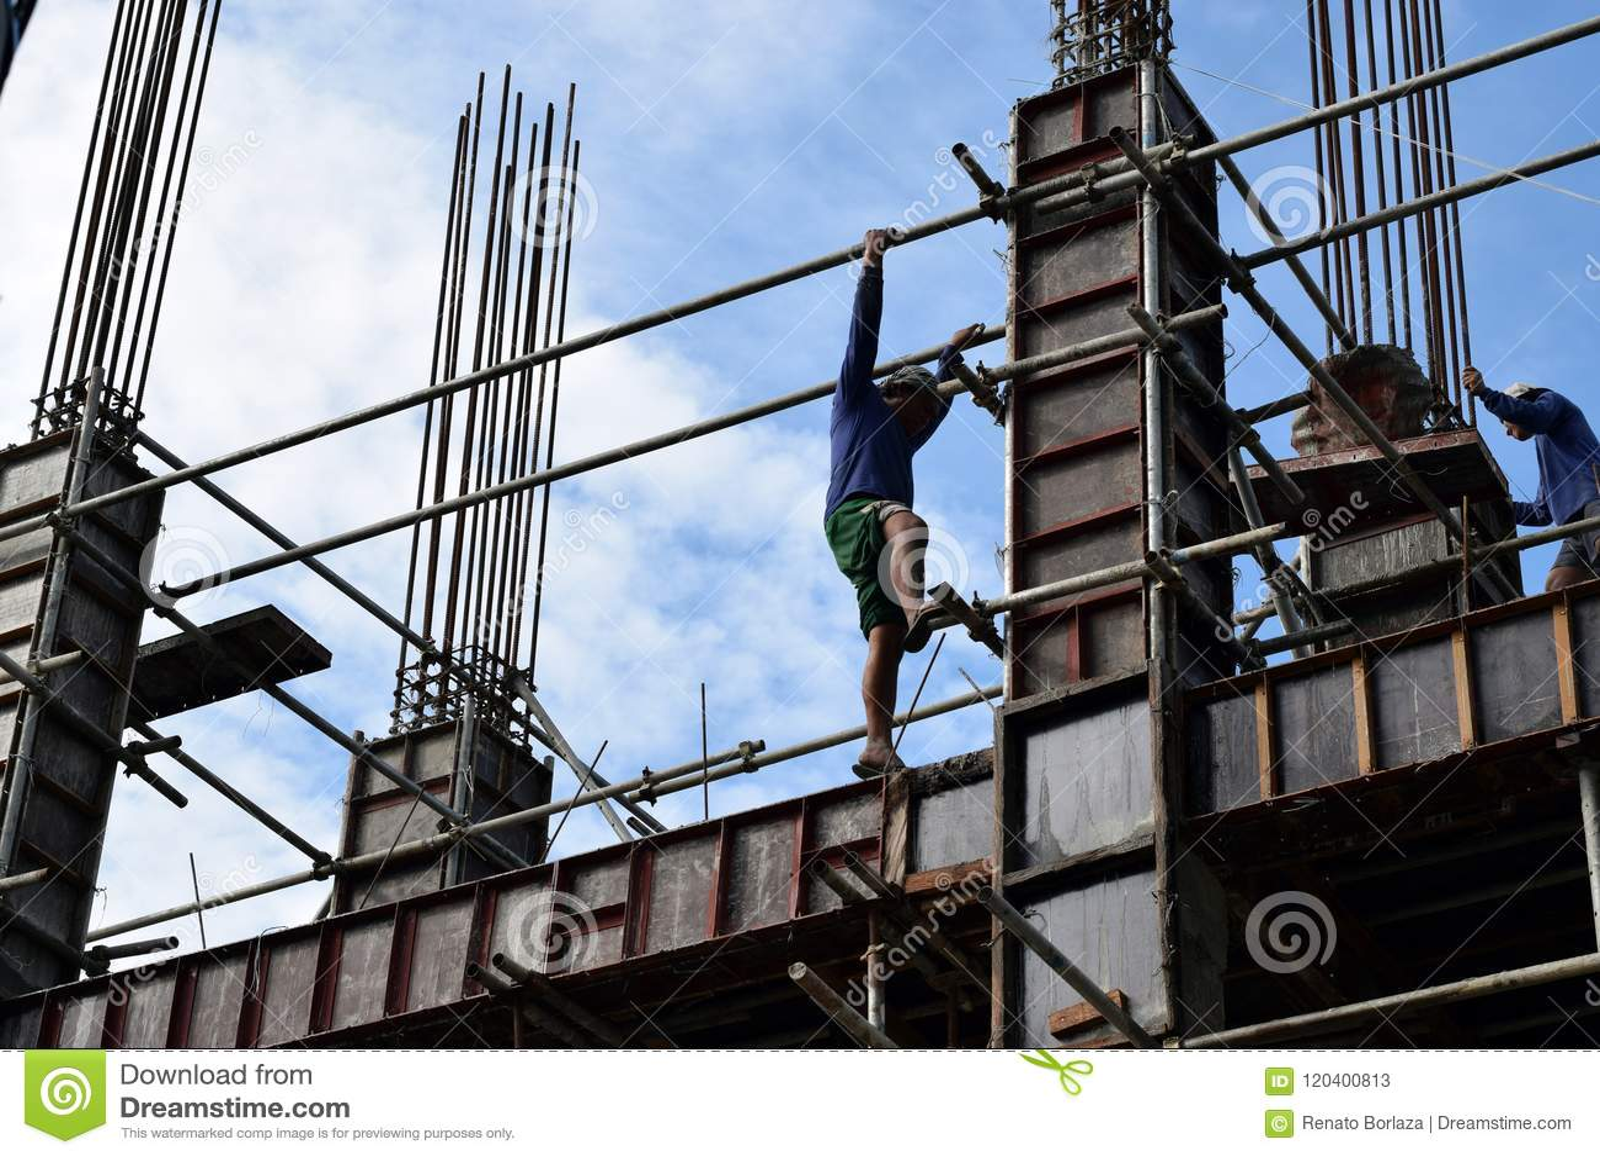 Filipino Construction Steel-man Climbing Down Using Scaffolding